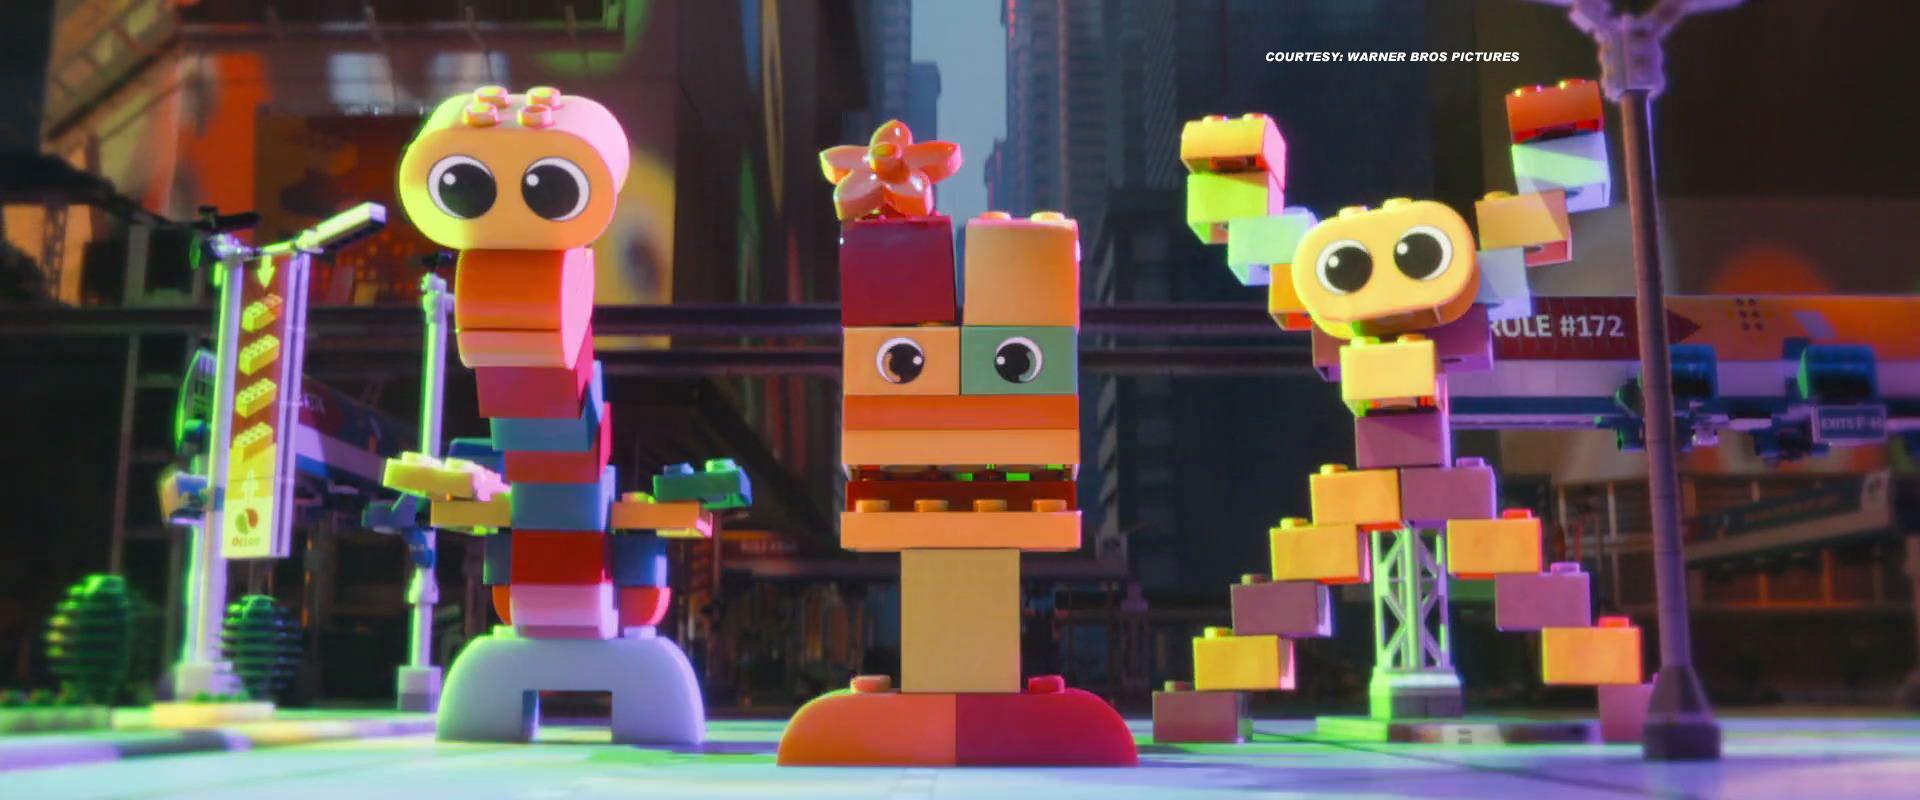 lego movie 2 opening scene